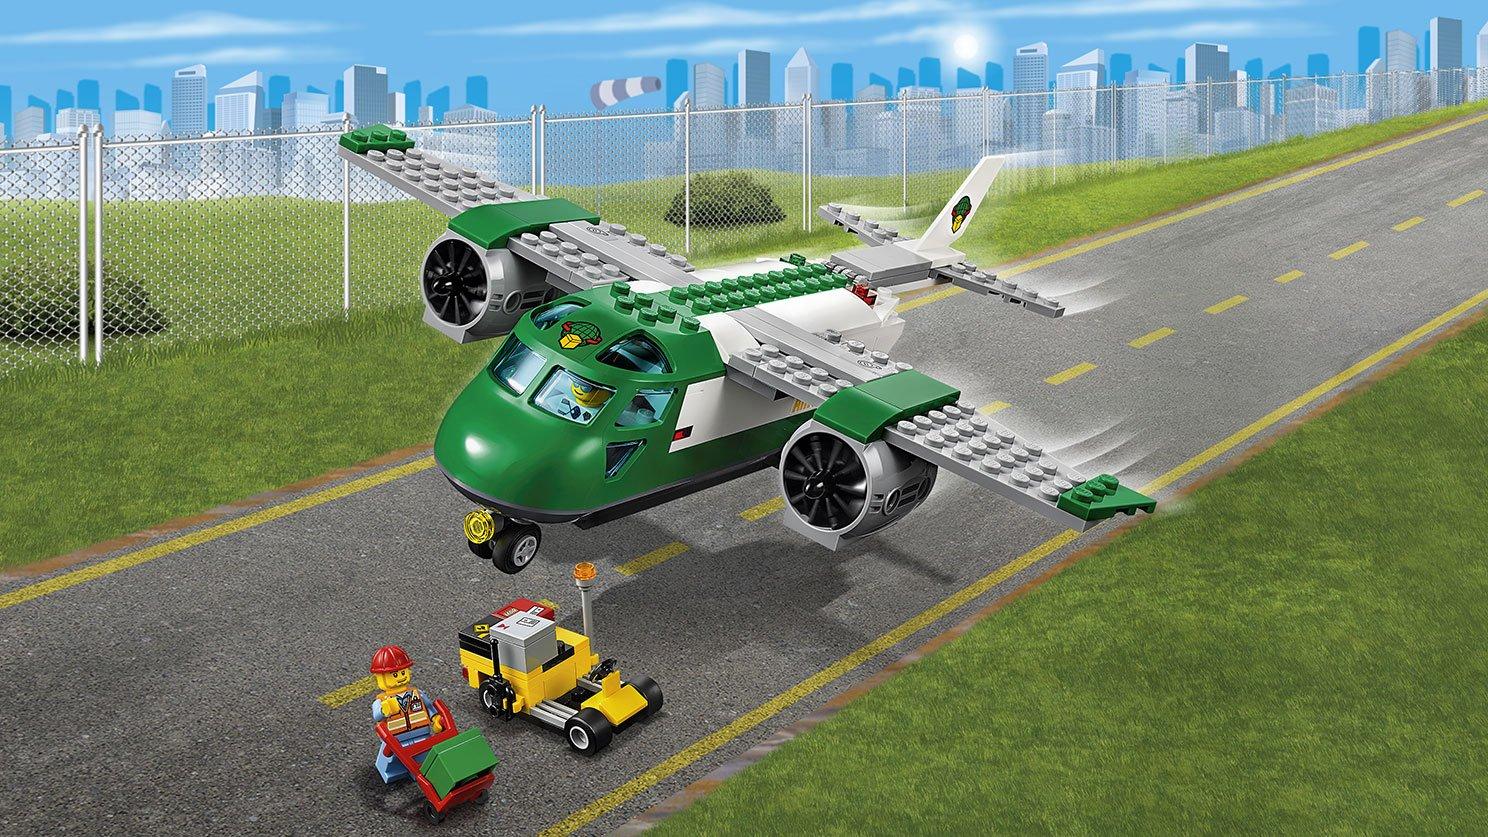 LEGO 60101 Samolot transportowy